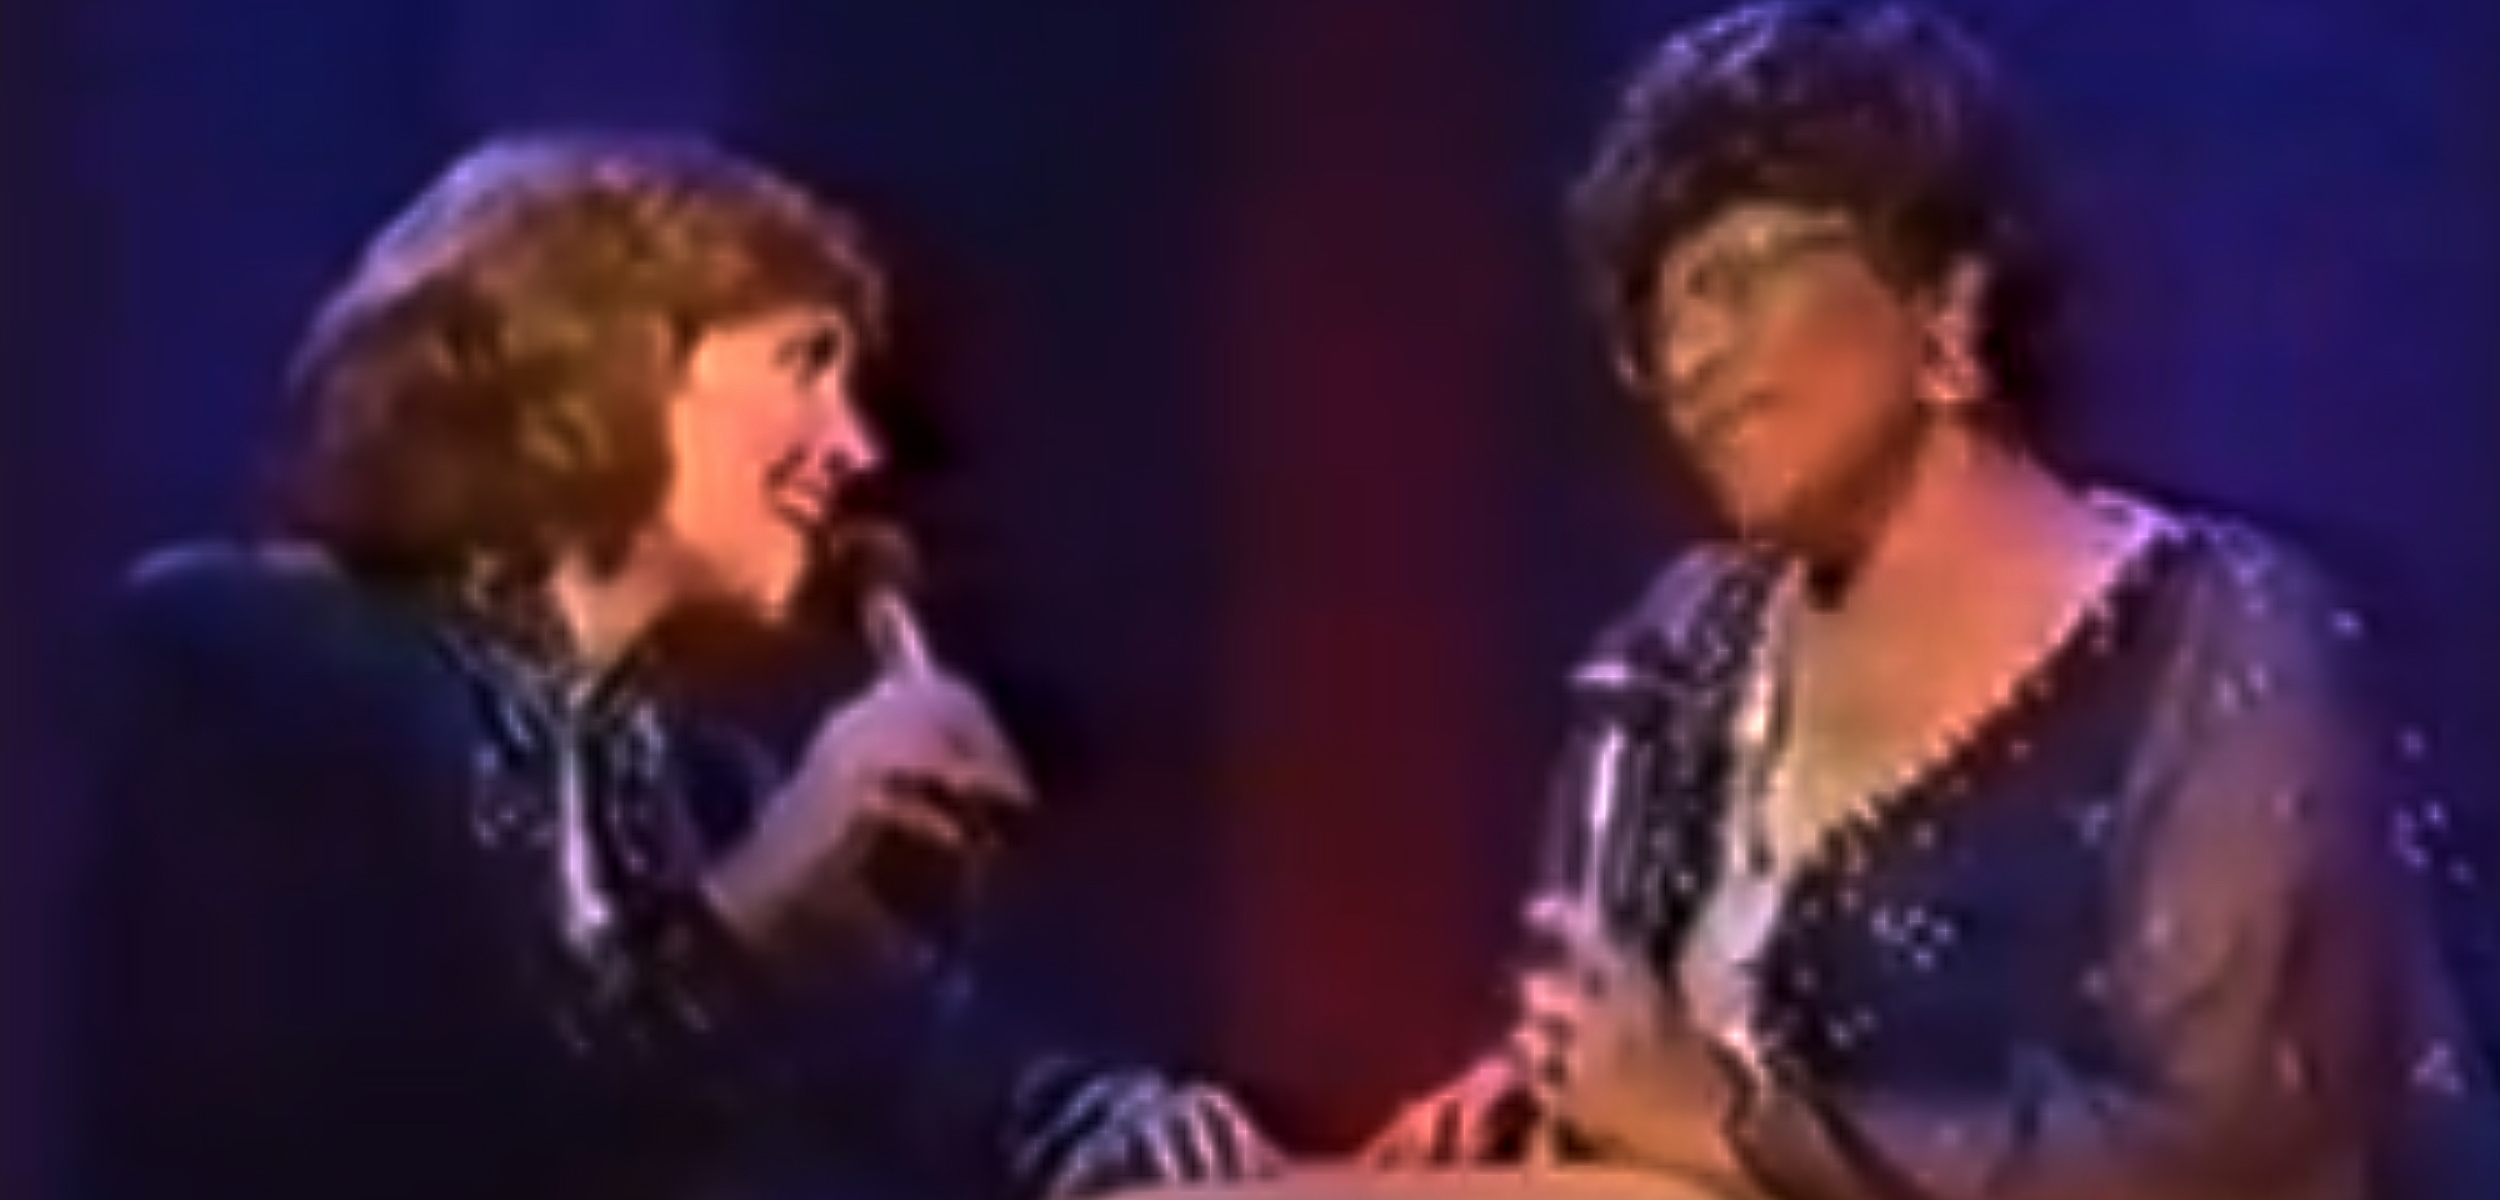 Karen Carpenter and Ella Fitzgerald